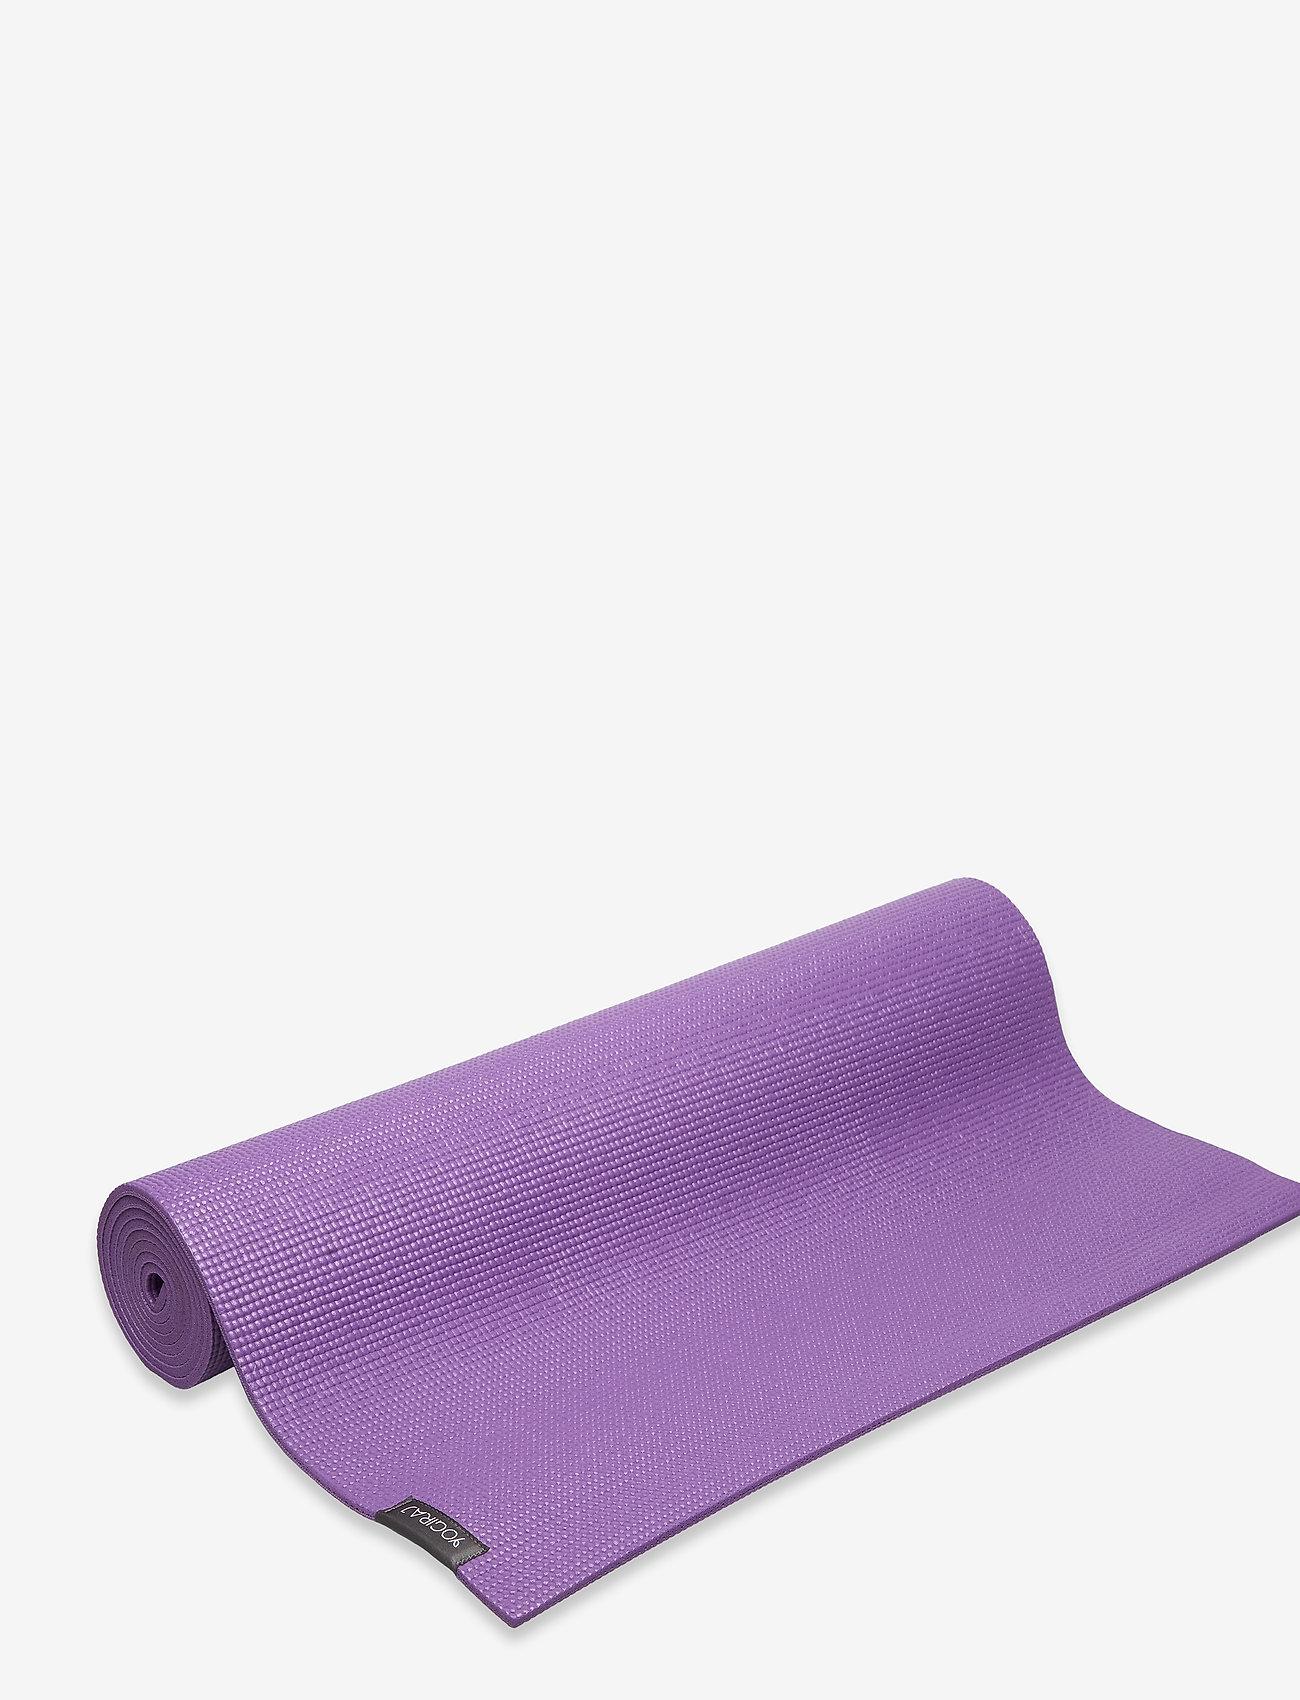 Yogiraj - All-round yoga mat 6 mm - Yogiraj - yogamatten & ausrüstung - lilac purple - 0